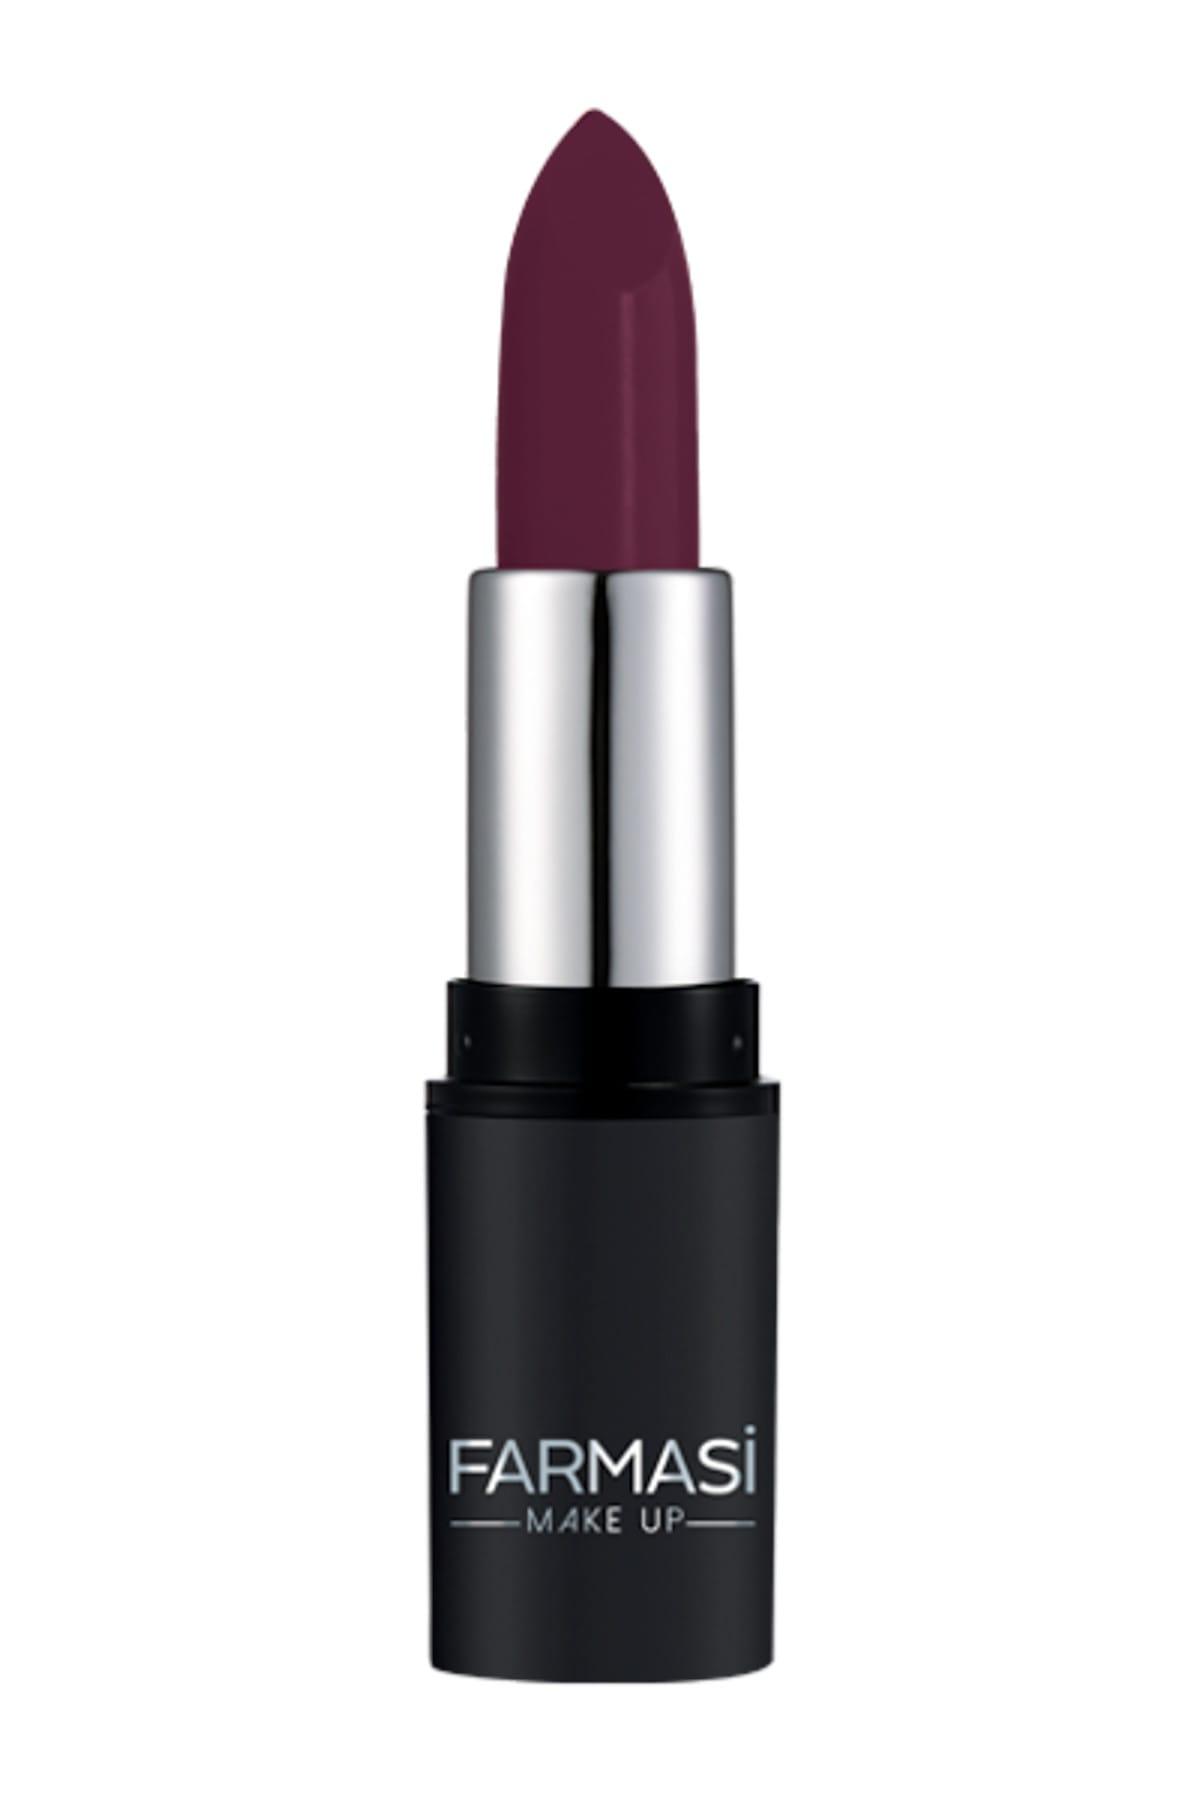 Farmasi Mat Ruj - Matte Lipstick Metallic Berry No: 21 4 g 8690131768096 1